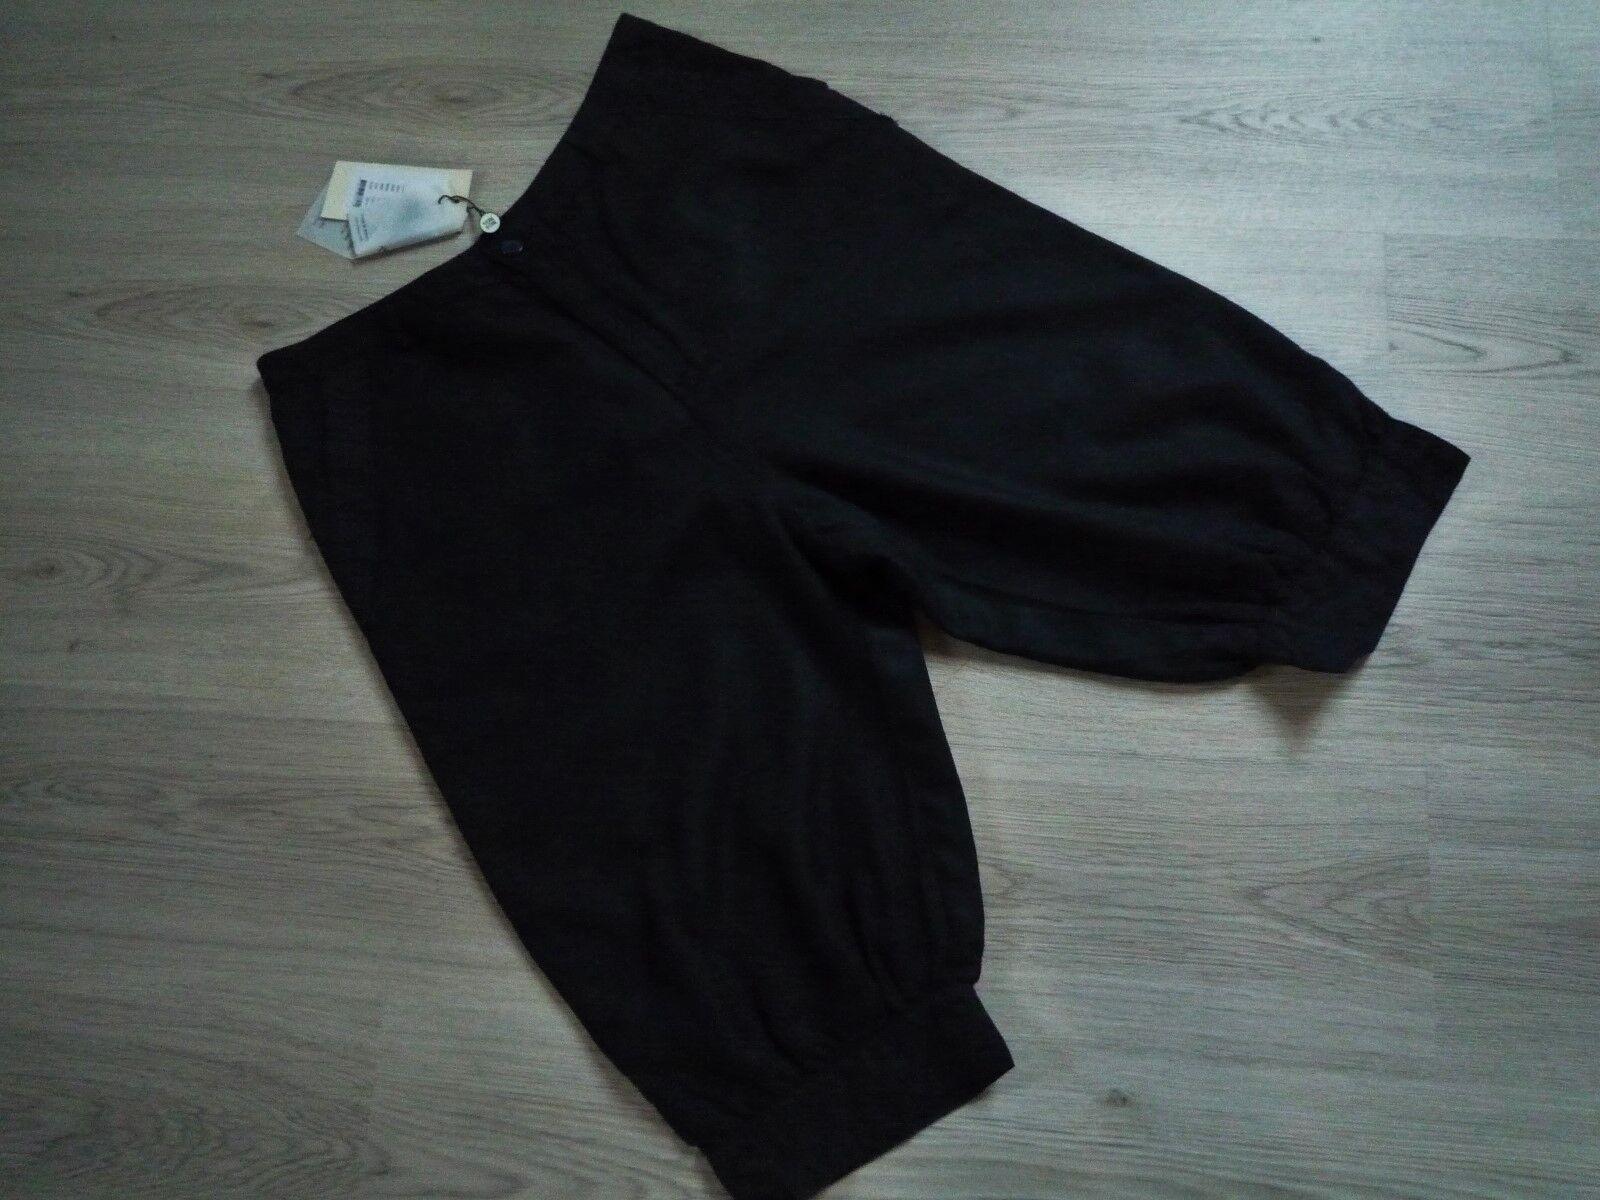 "Noa Noa Pantalon Culotte d& 039;équitation bollerhose Pince ""wistle Wool"" Größe M neuf M et."